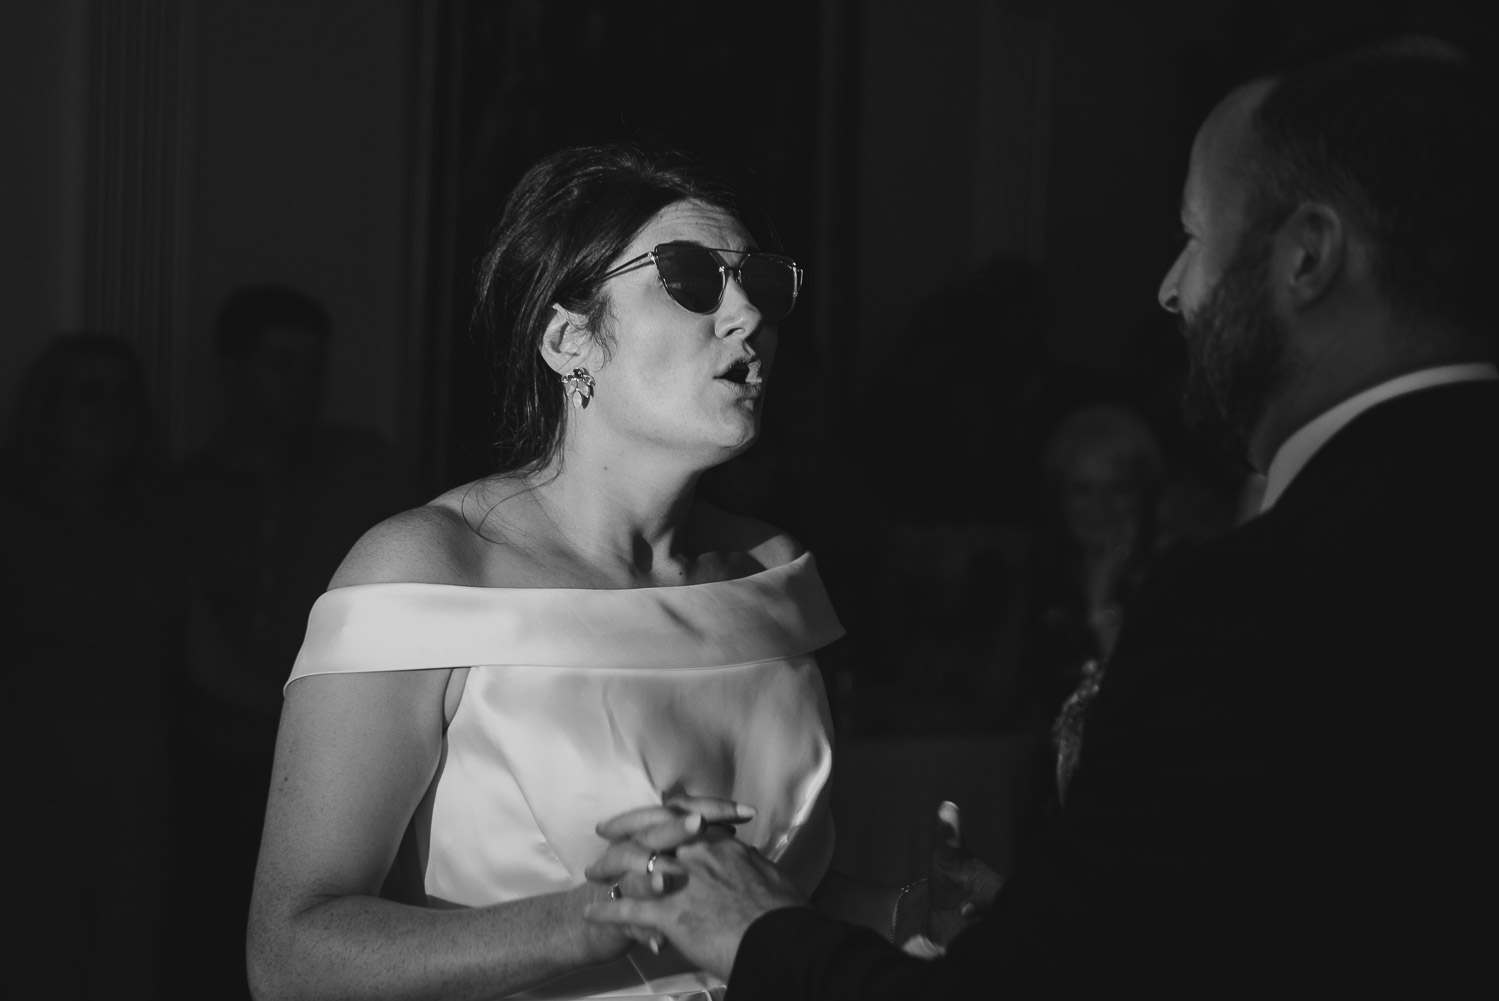 gascony_bordeaux_south_west_france_wedding_tarn_katy_webb_photography_UK102